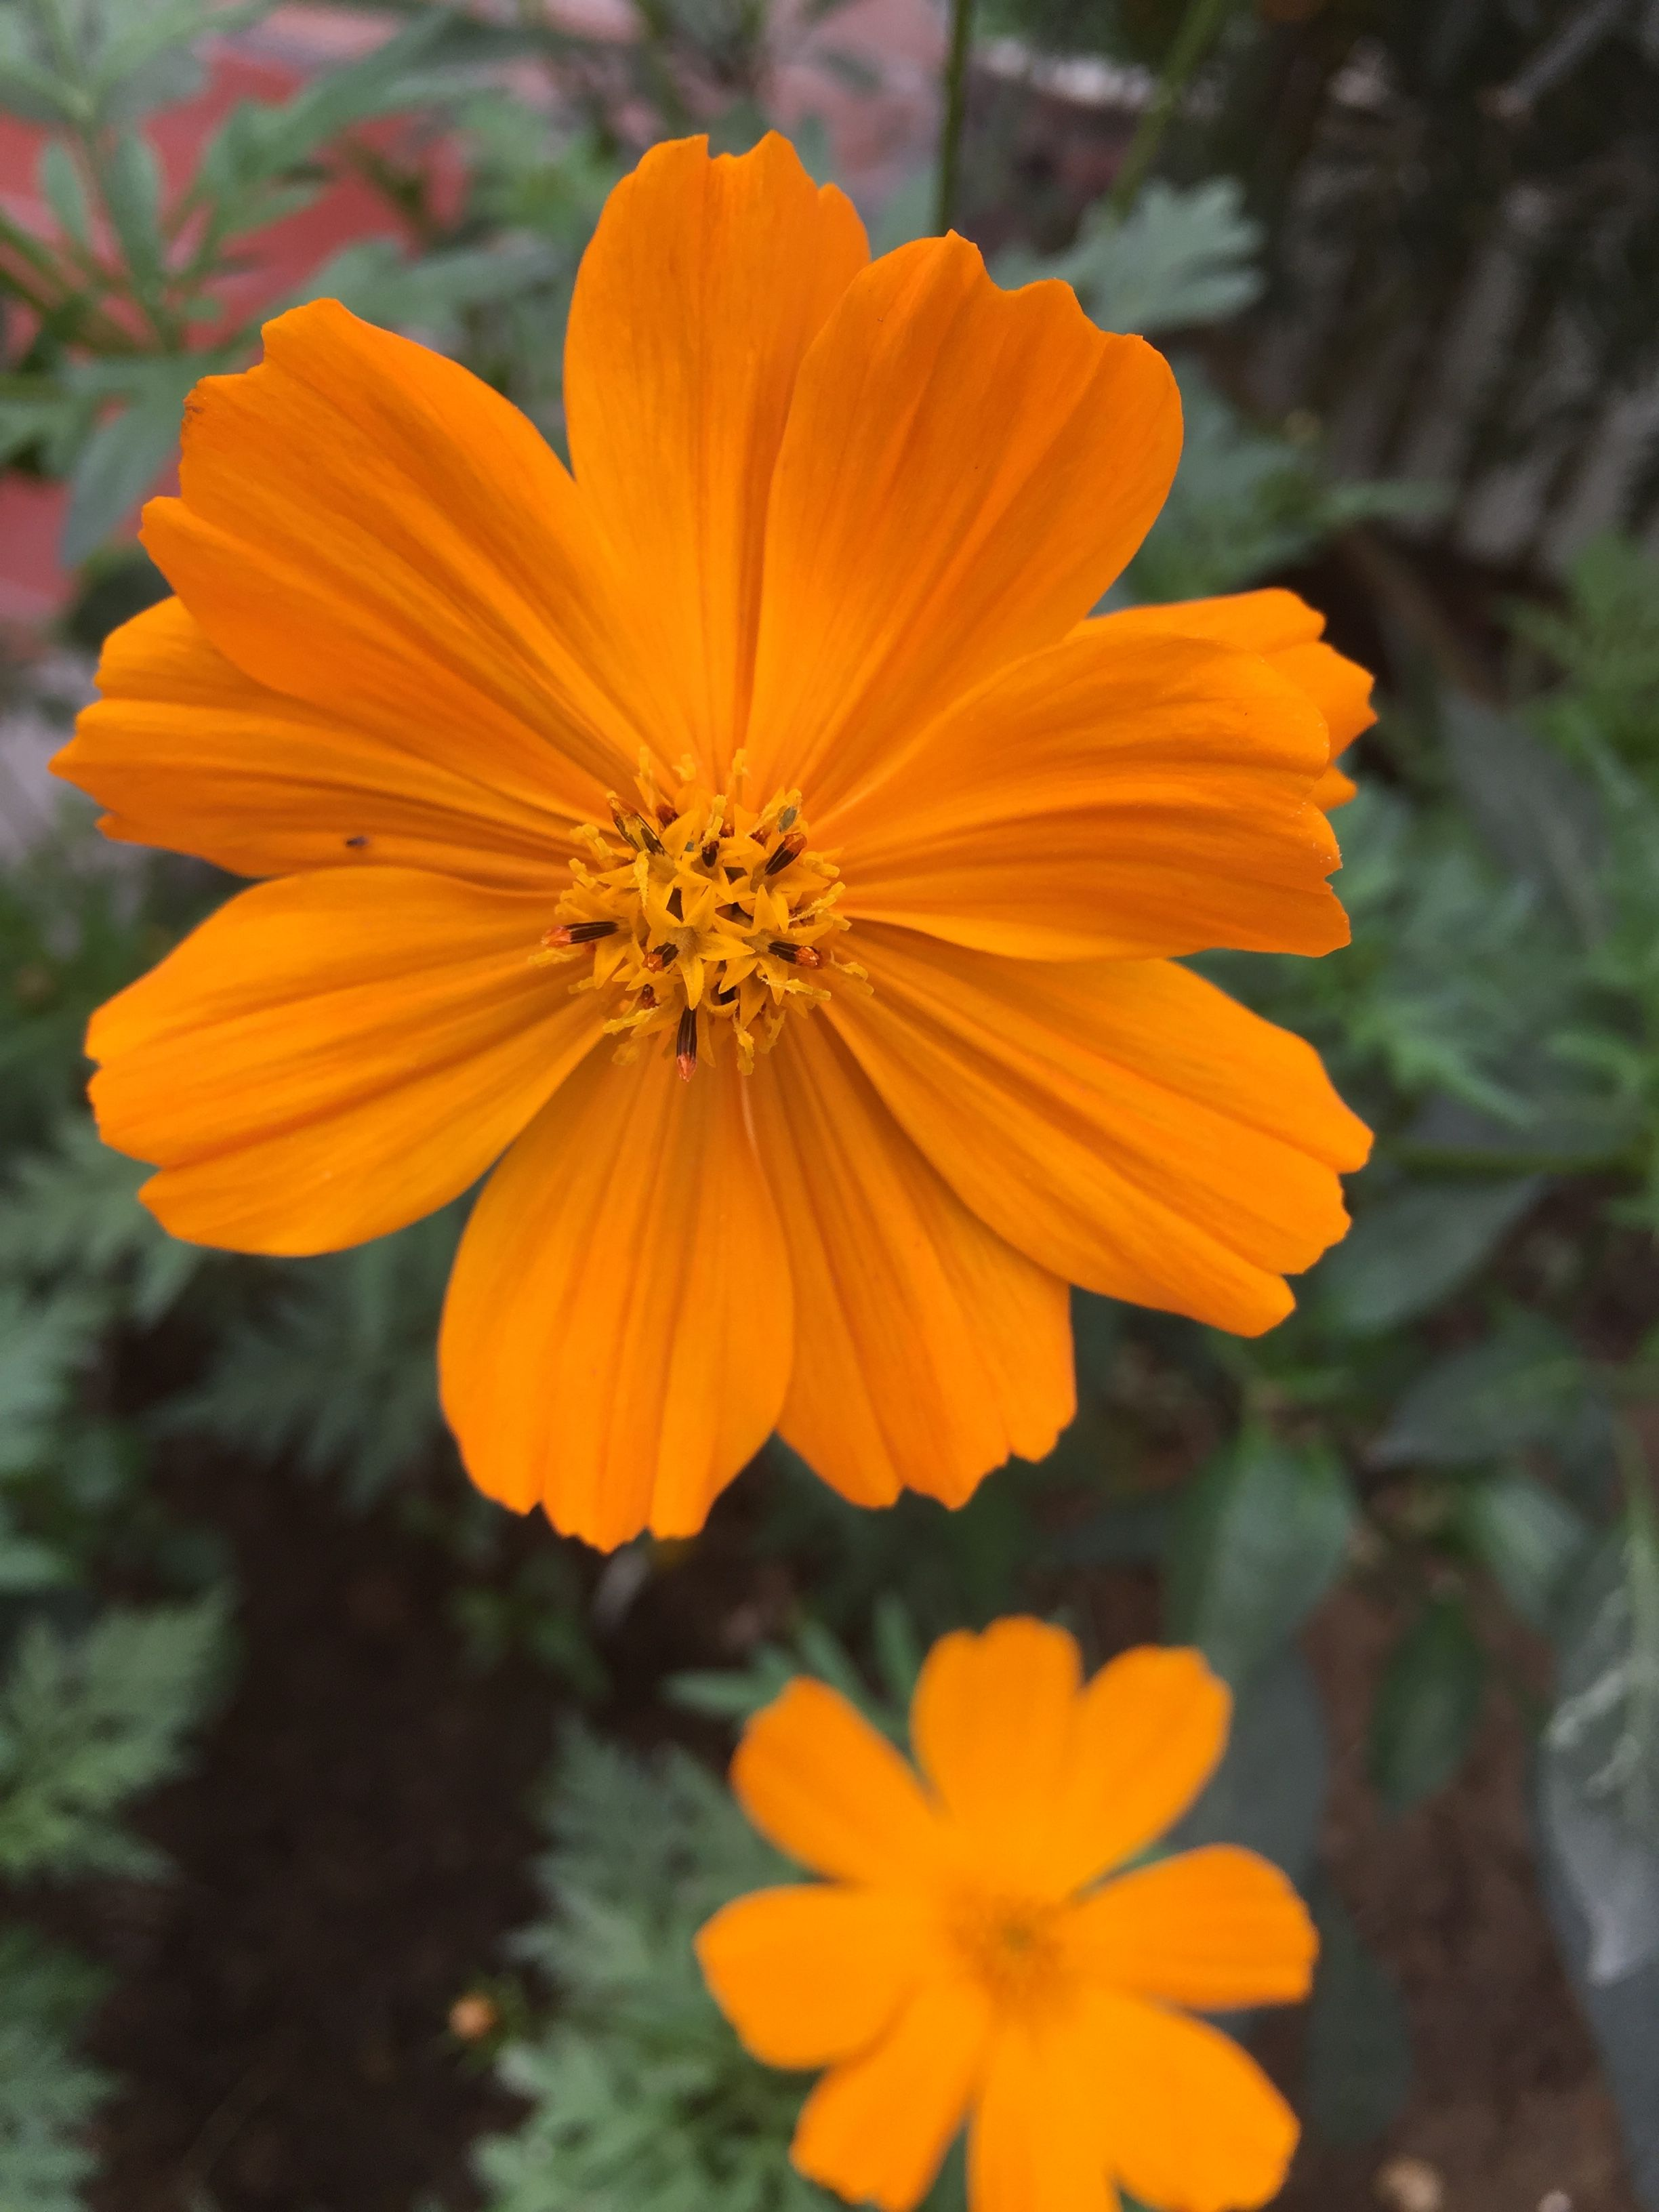 Pin By Giovana Sandrin On Cosmo Amarelo Orange Plant Cosmos Flowers Plants